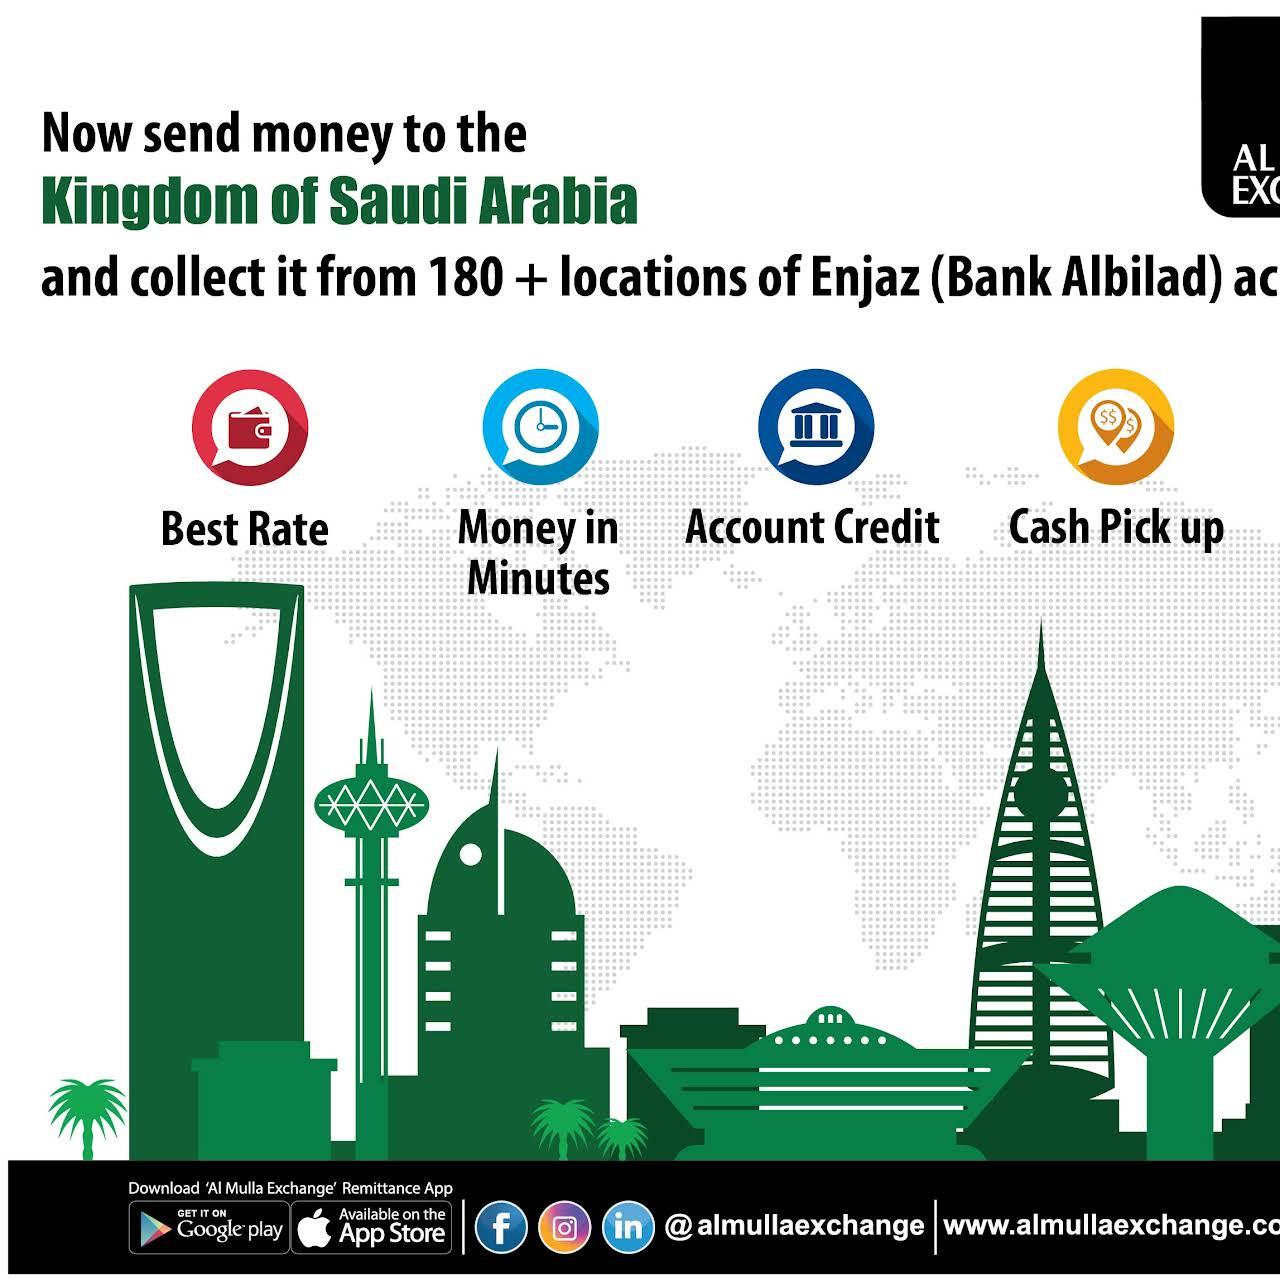 Al Mulla Exchange - Money Transfer Service in Adailiya